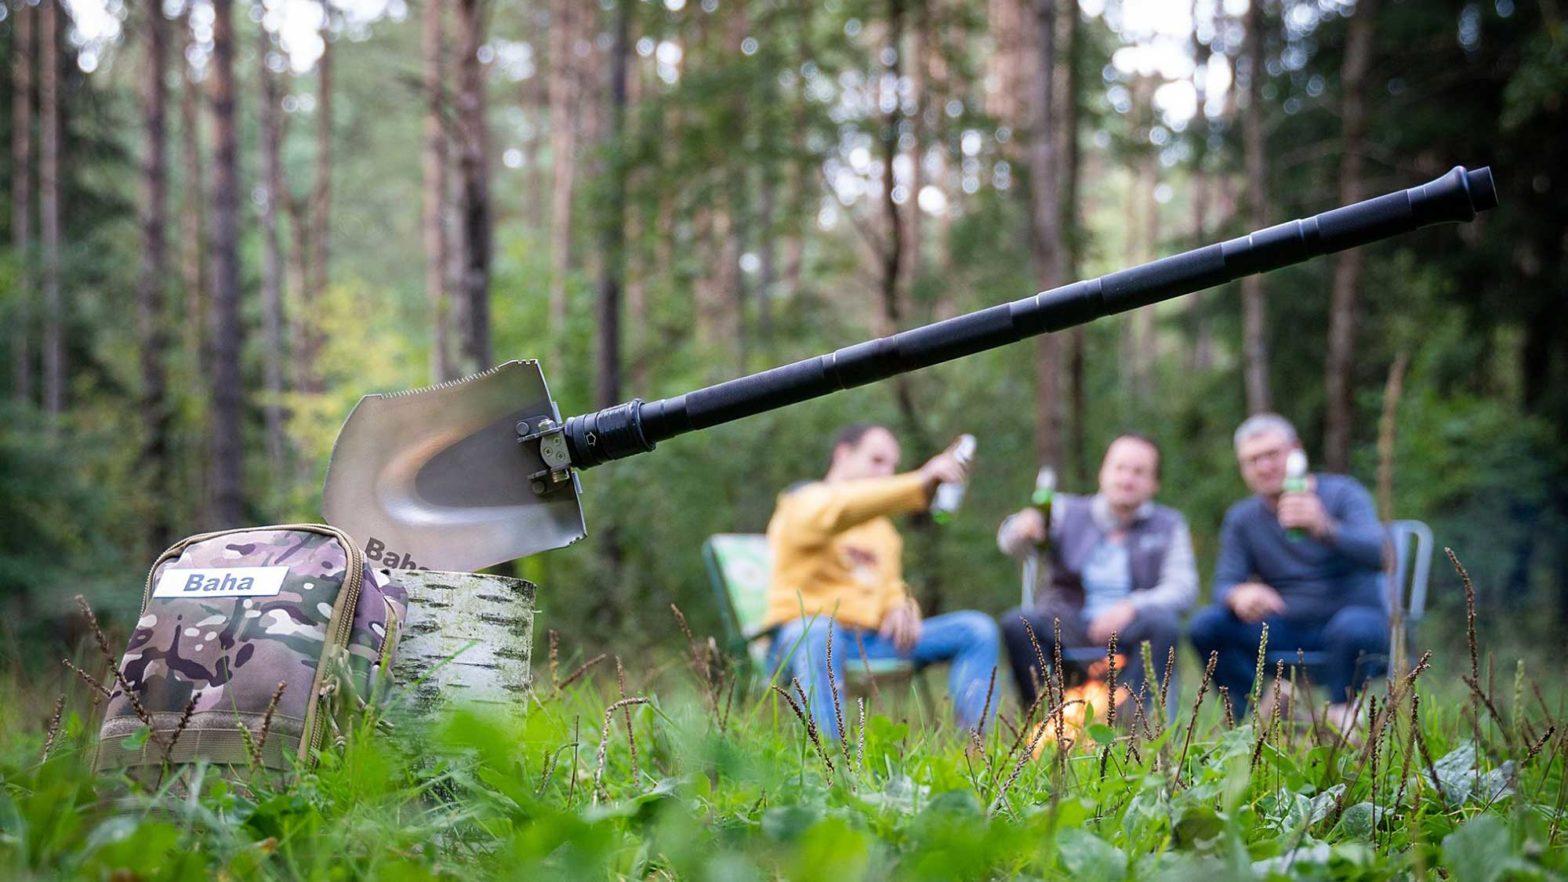 Baha Multi-function Survival Gear Shovel